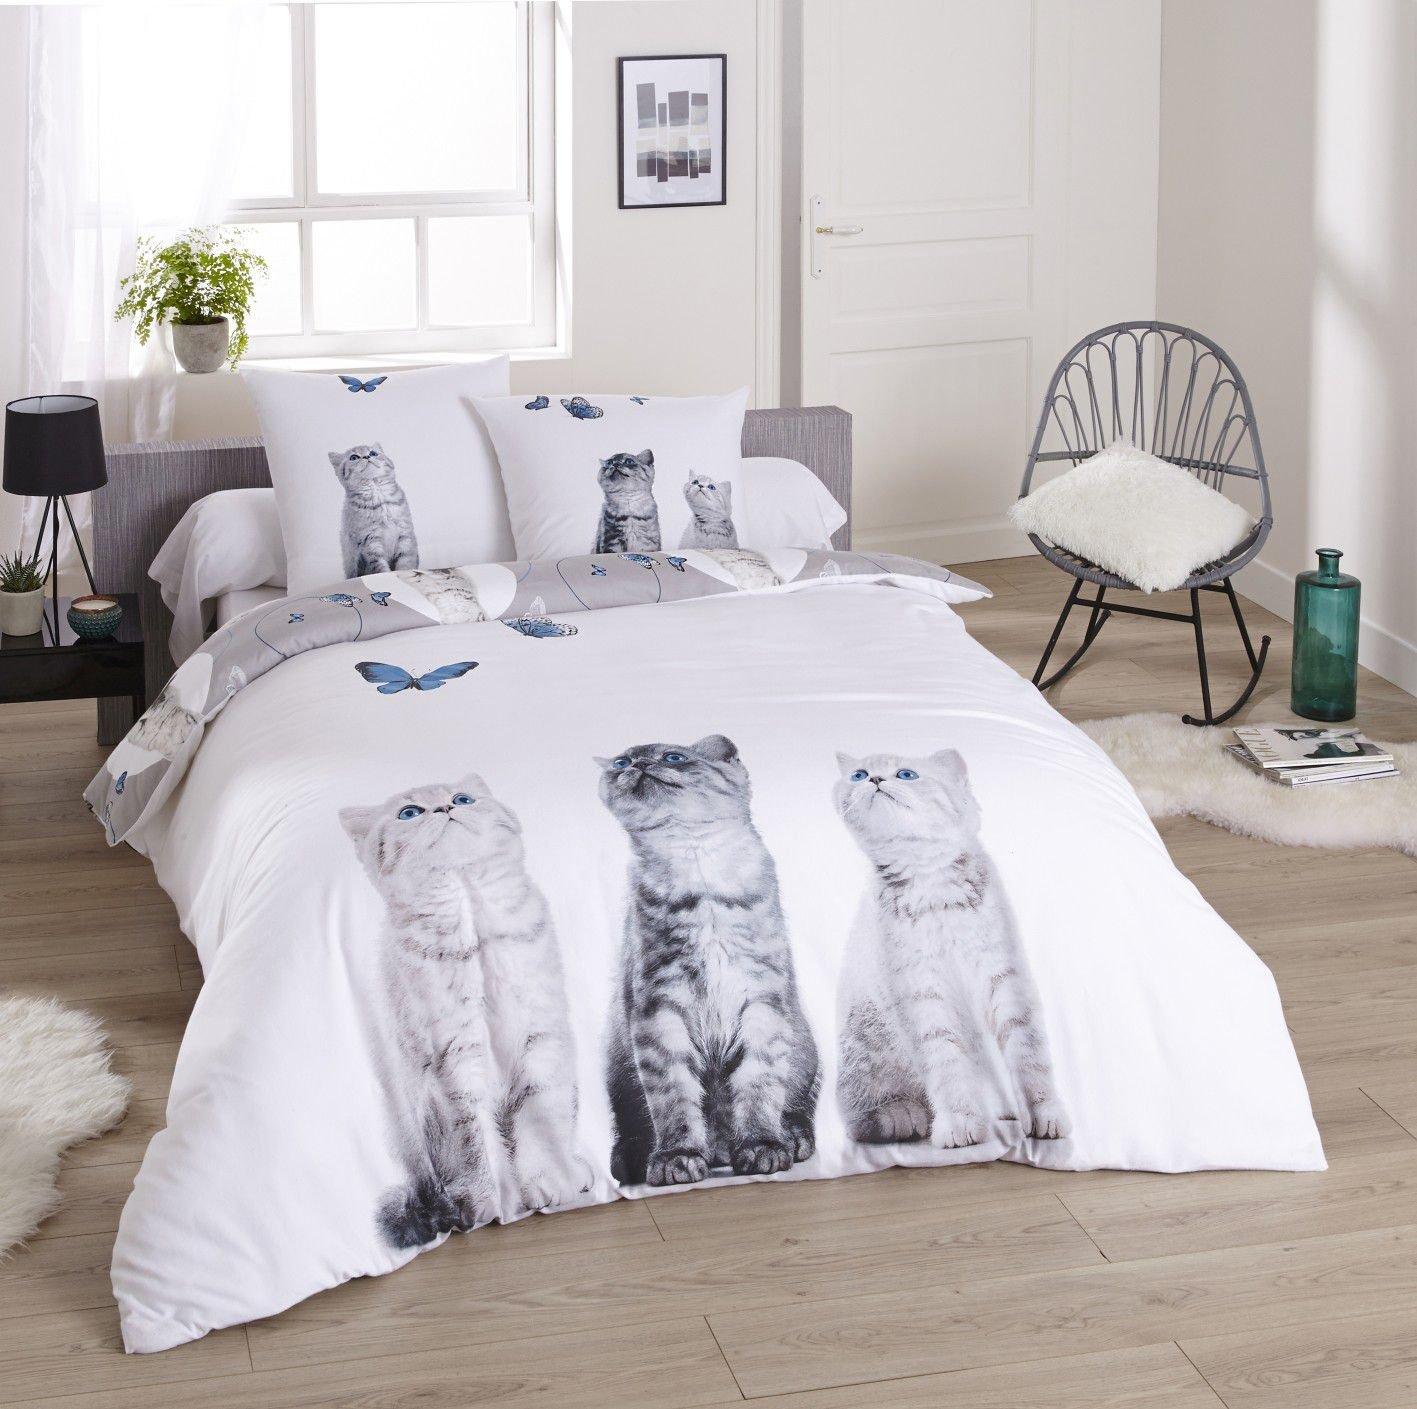 Funda nórdica de franela 100% algodón - tres gatos 140 x 200 cm + 1 funda de almohada 65 x 65 cm): Amazon.es: Hogar